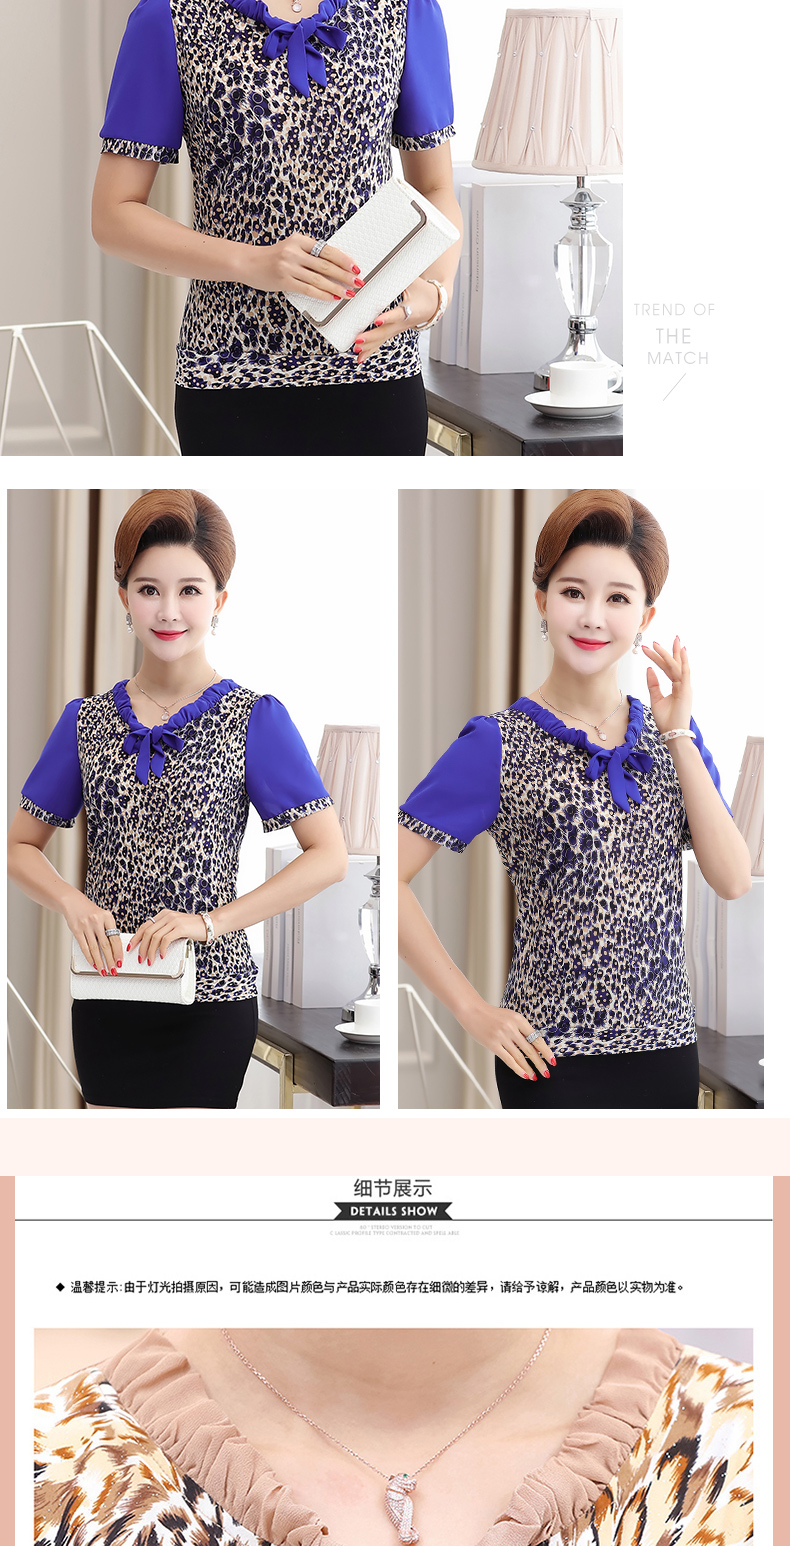 Women Summer Blouses Khaki Blue Leopard Print Crepe Tops Female Short Sleeve Bowknot Round Collar Tunic Woman Casual Blouse Shirt (17)